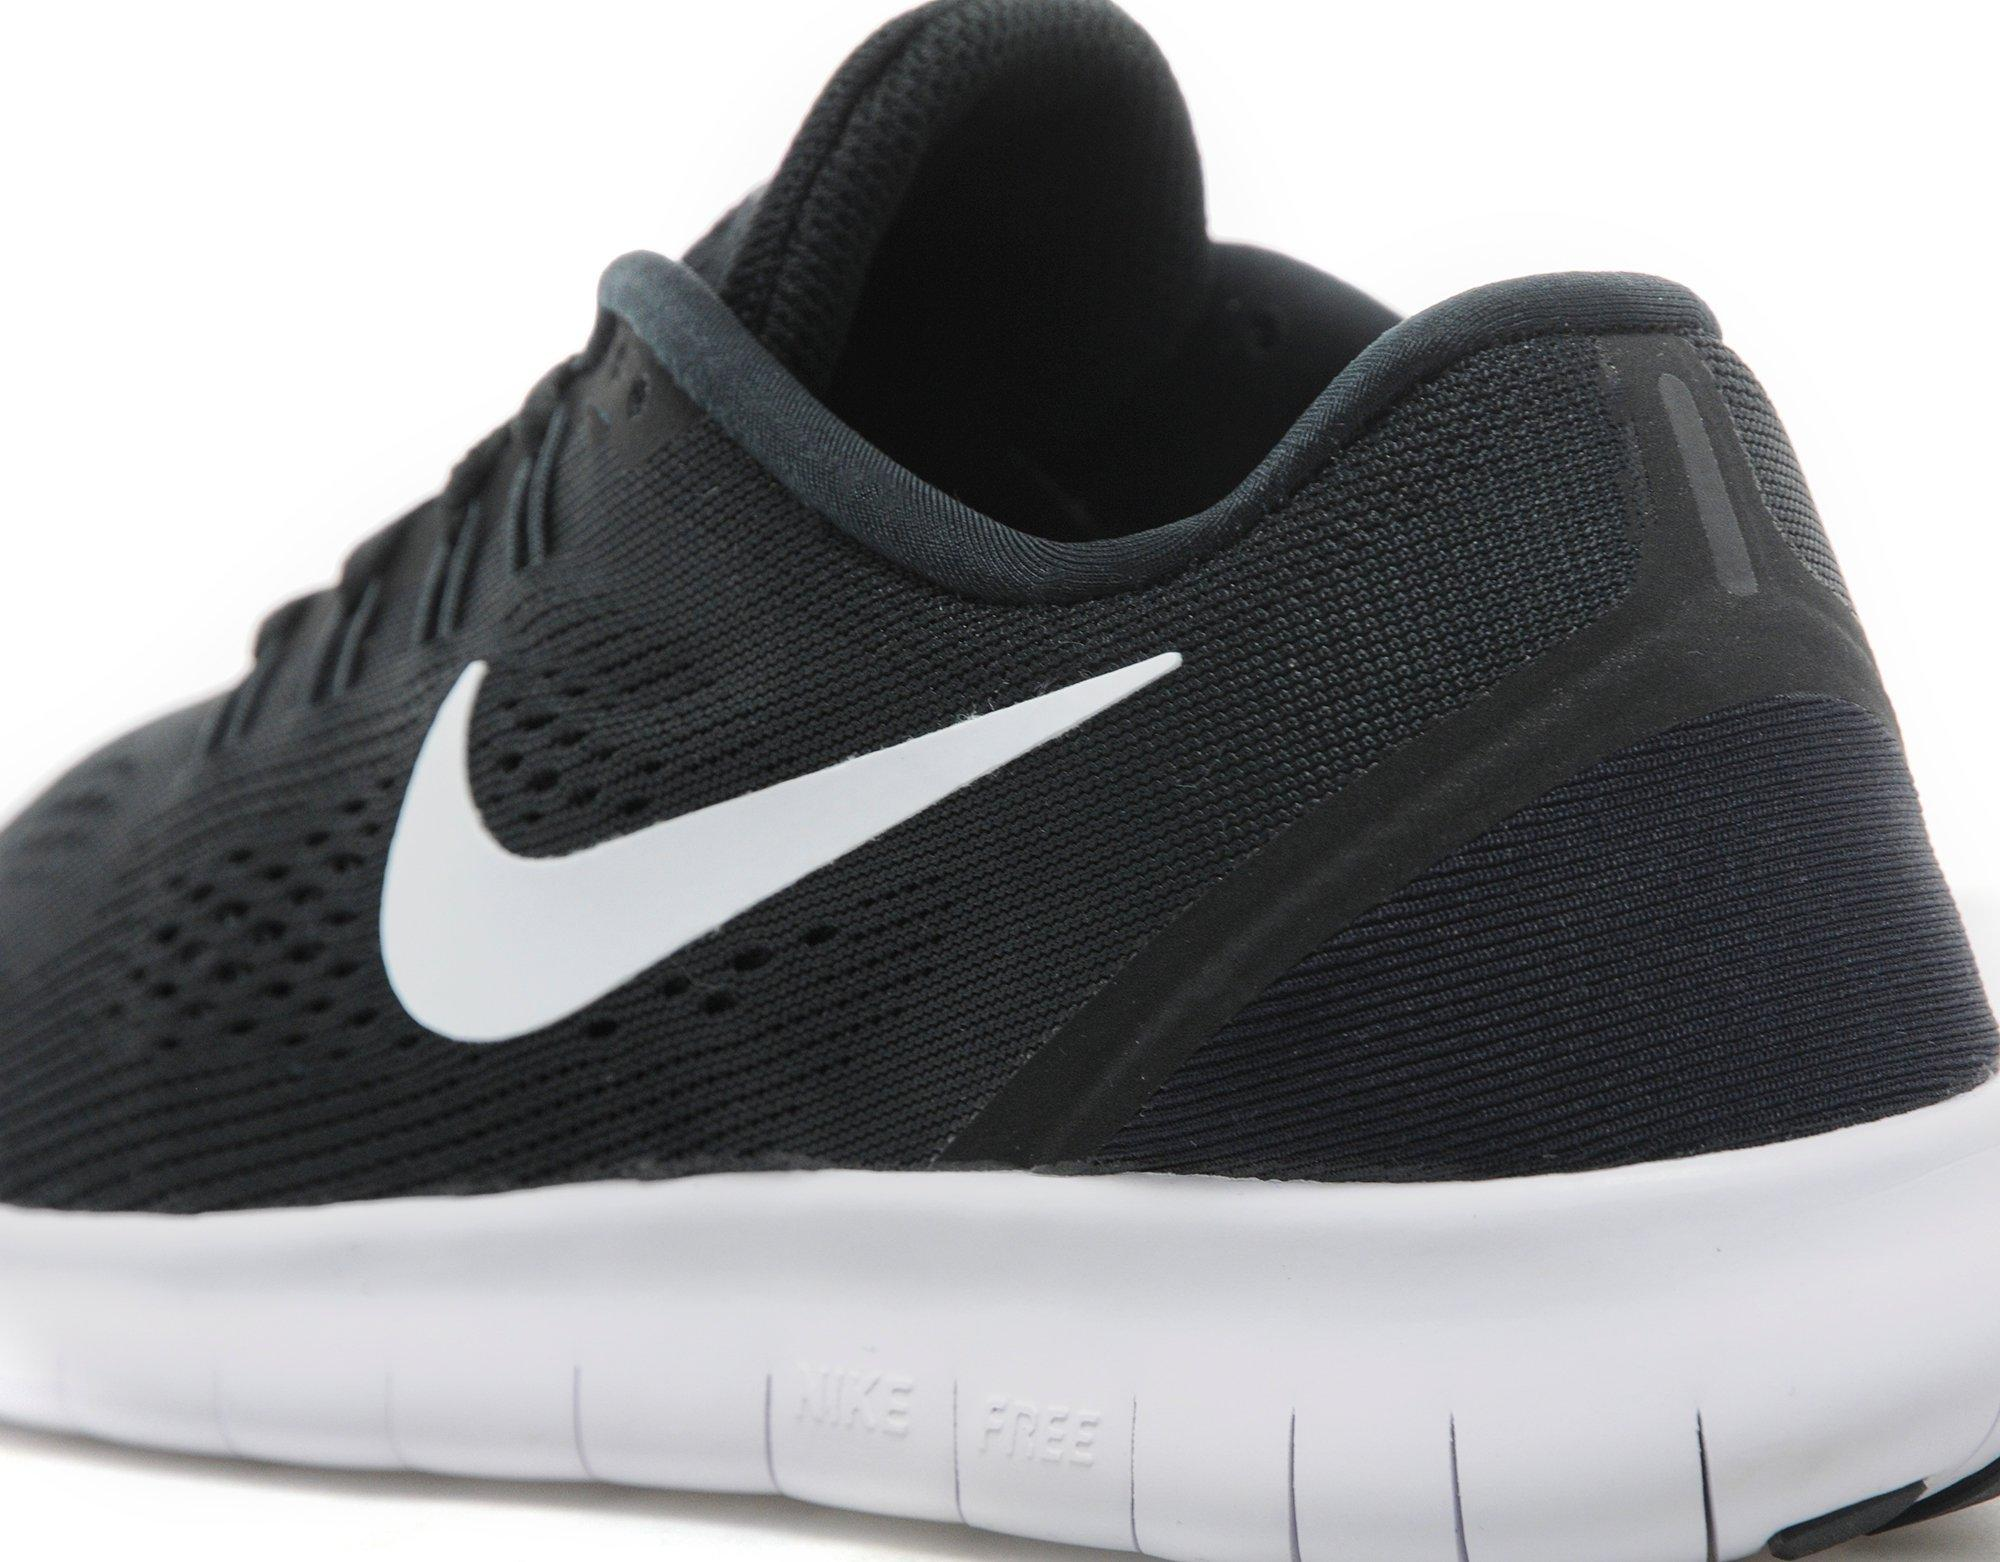 Nike Free Run Womens Uk Noir incroyable aberdeen vente tumblr LIQUIDATION p1w9tmy7